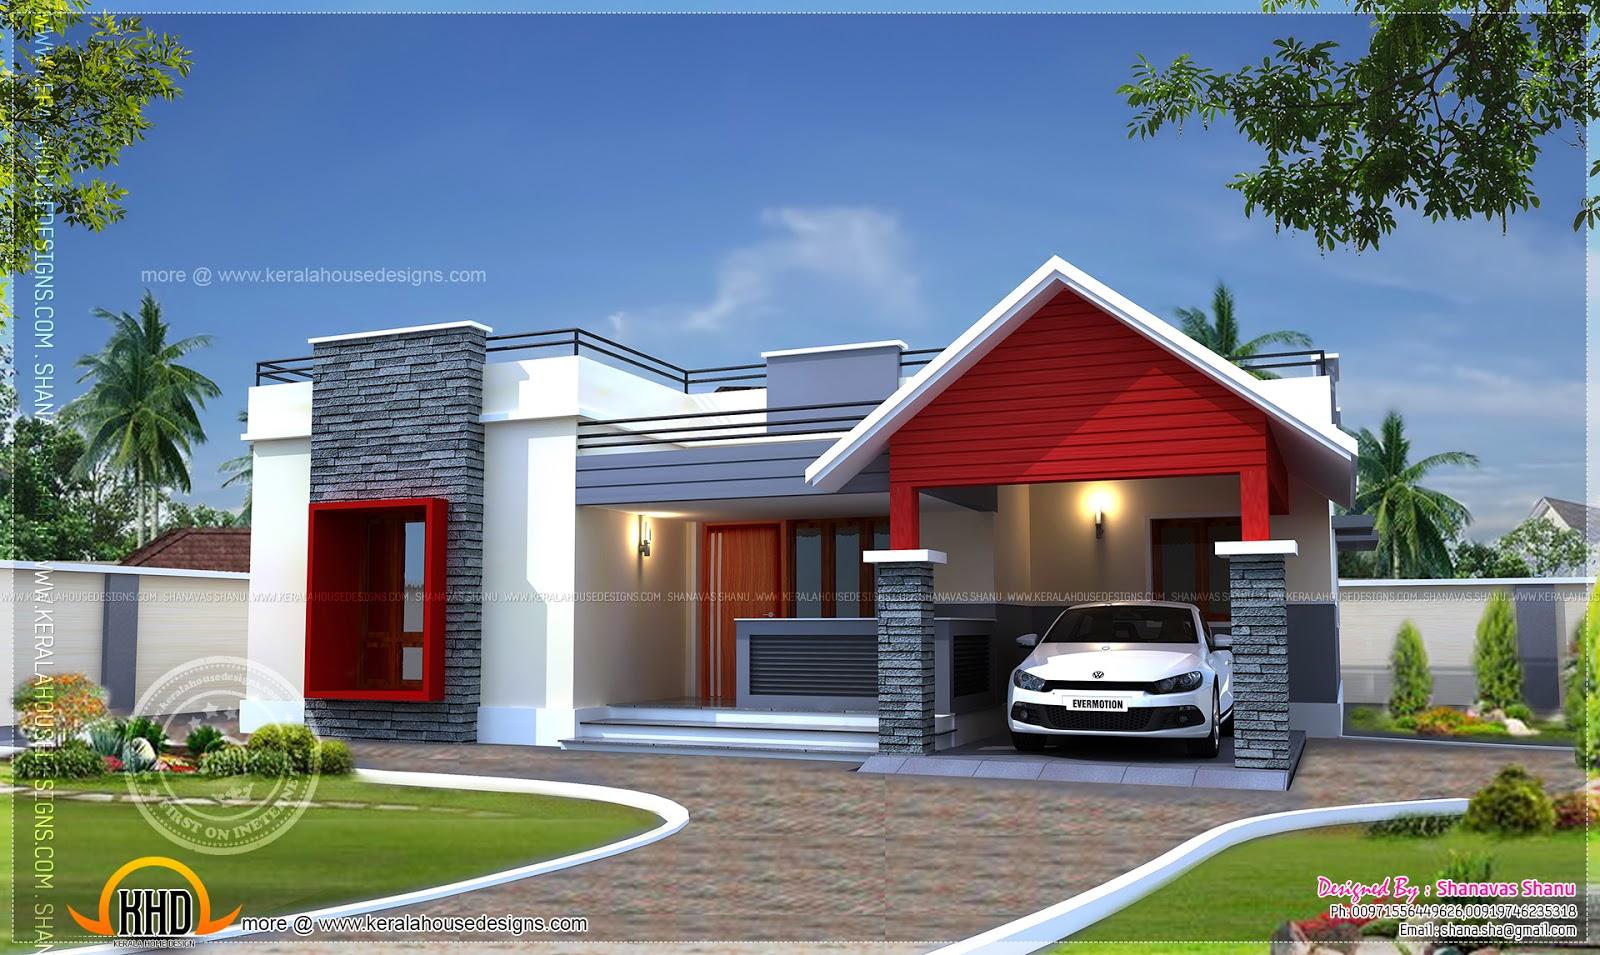 Single floor home plan in 1400 square feet - Kerala home ...